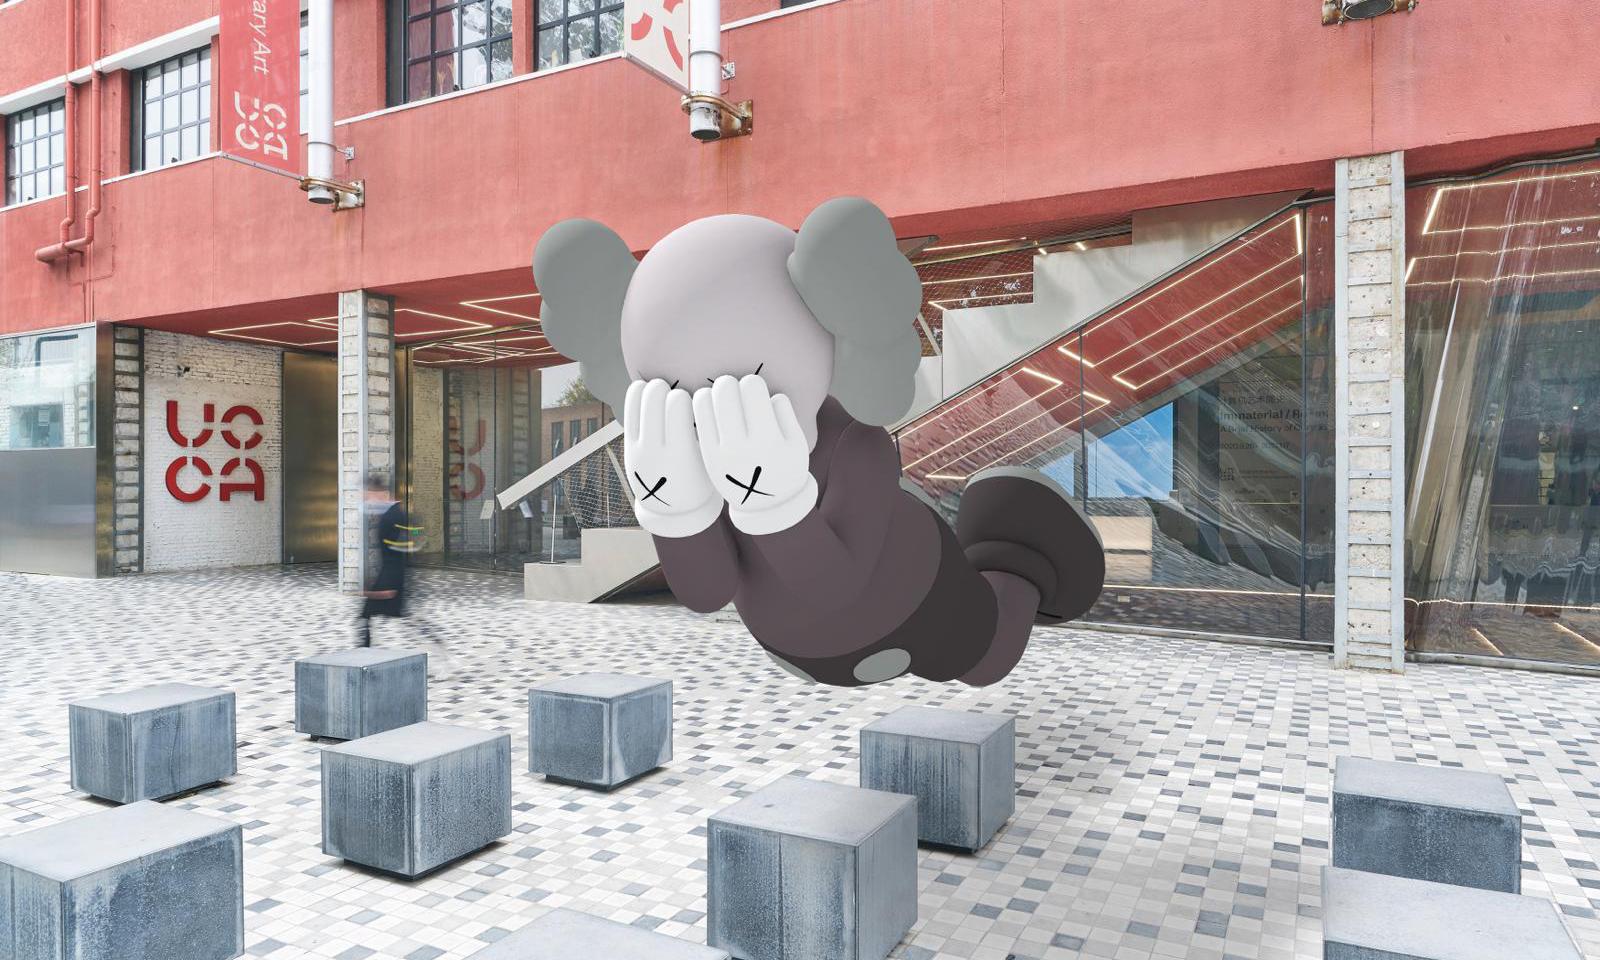 UCCA 尤伦斯当代艺术中心呈现 AR「幻景:当代艺术与增强现实」艺术特展